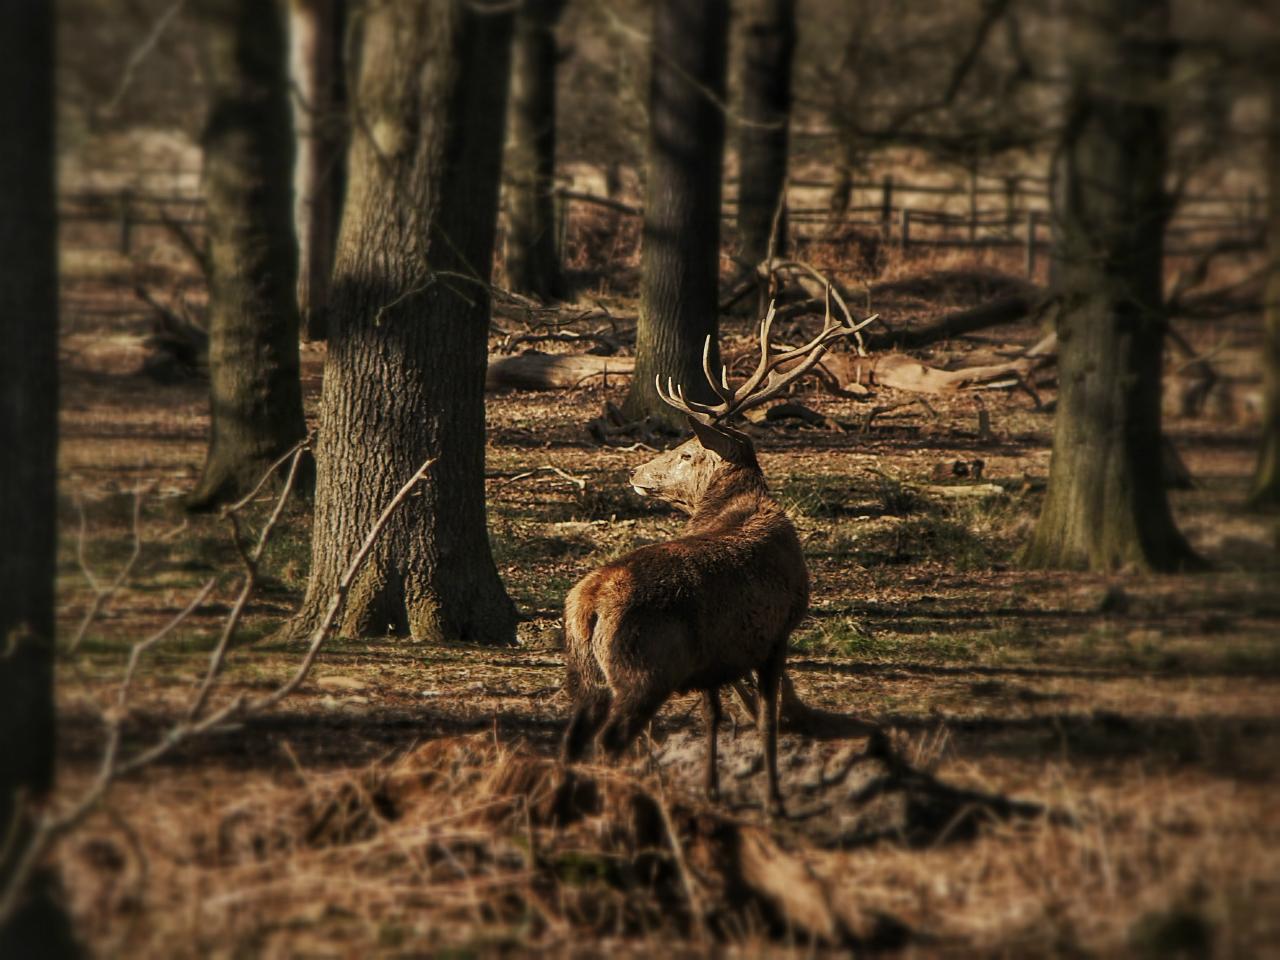 Red deer in Richmond Park (15 March 2014)